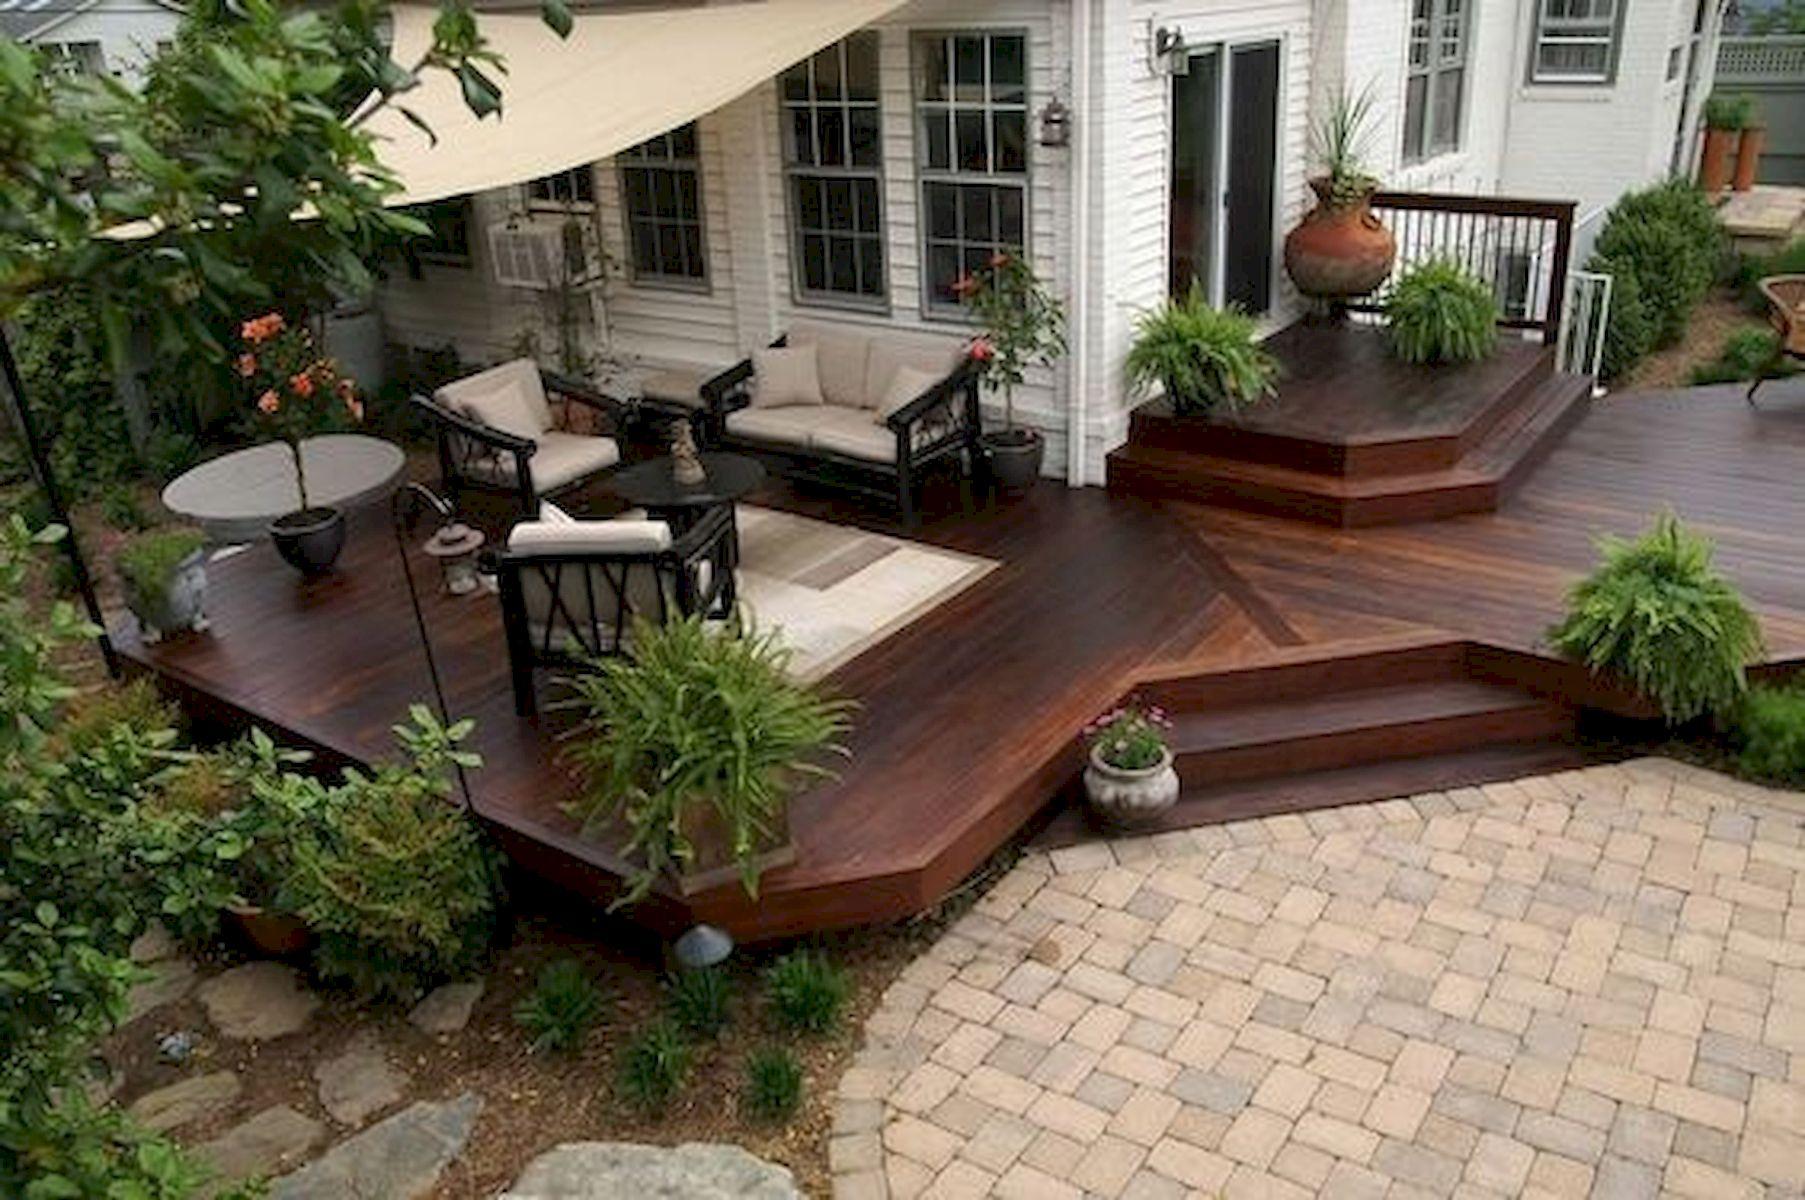 50 Best DIY Backyard Patio and Decking Design Ideas (5)